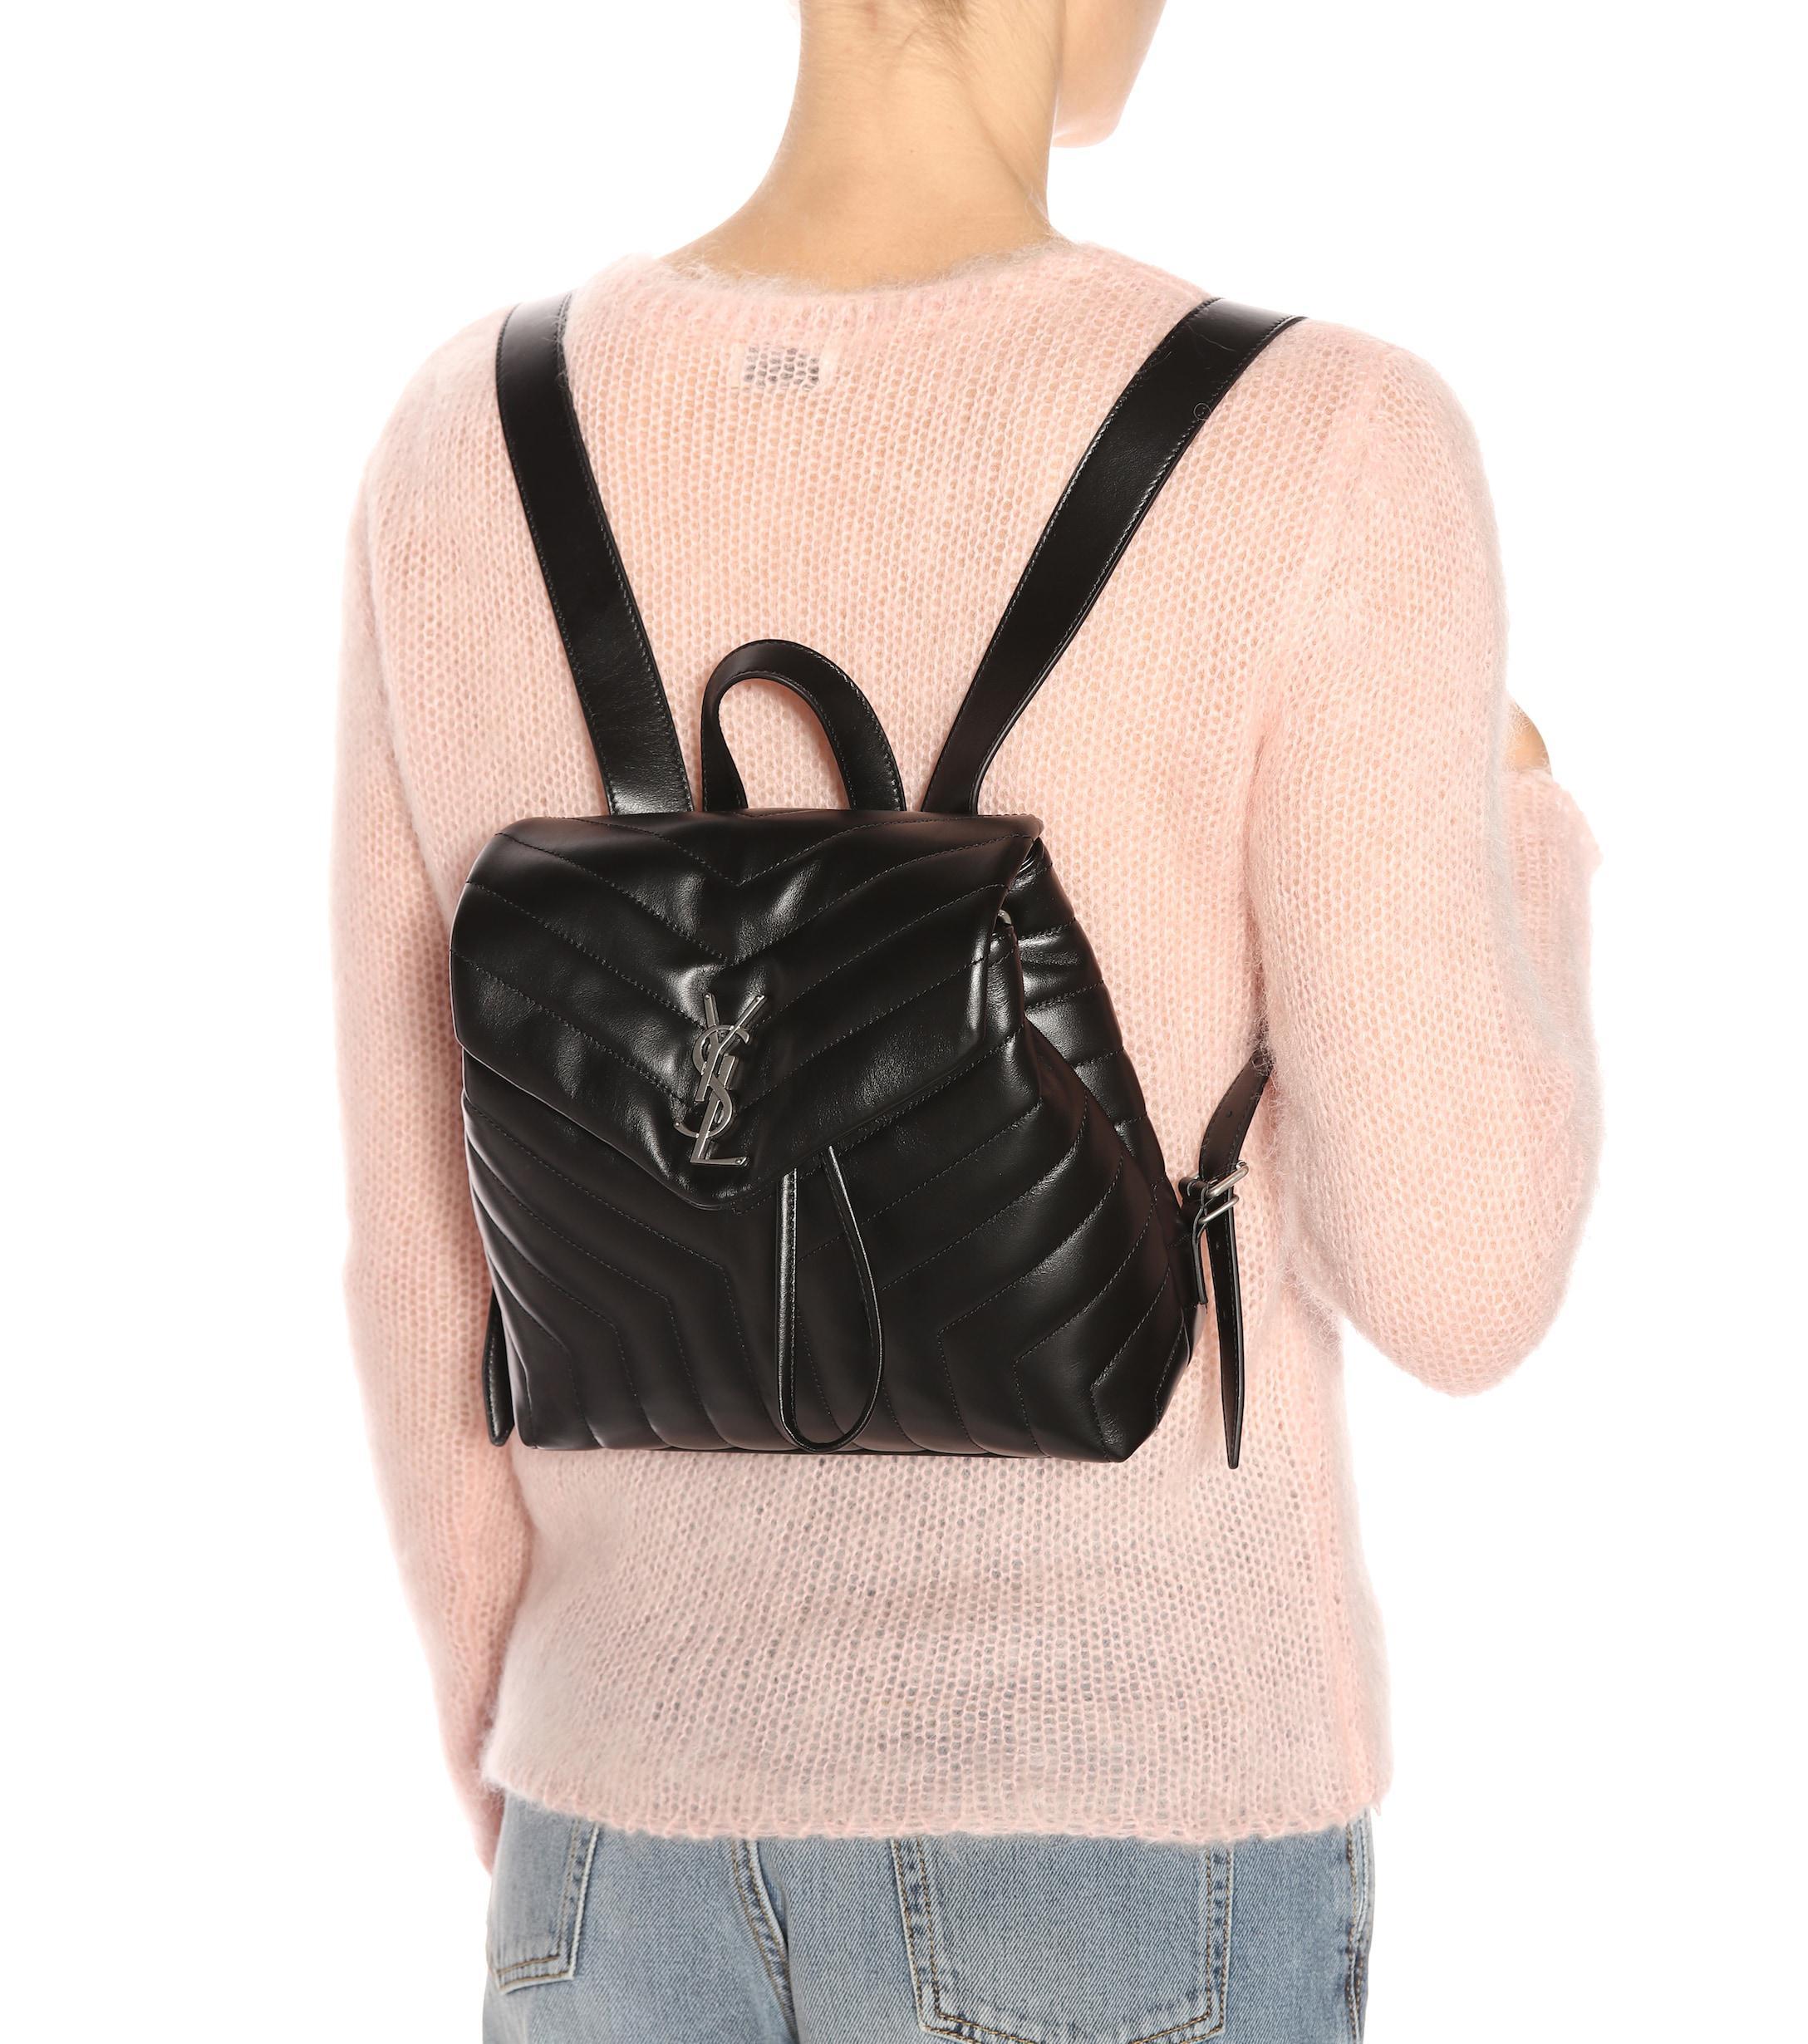 6792f44352c1 Saint Laurent - Black Small Loulou Monogram Backpack - Lyst. View fullscreen